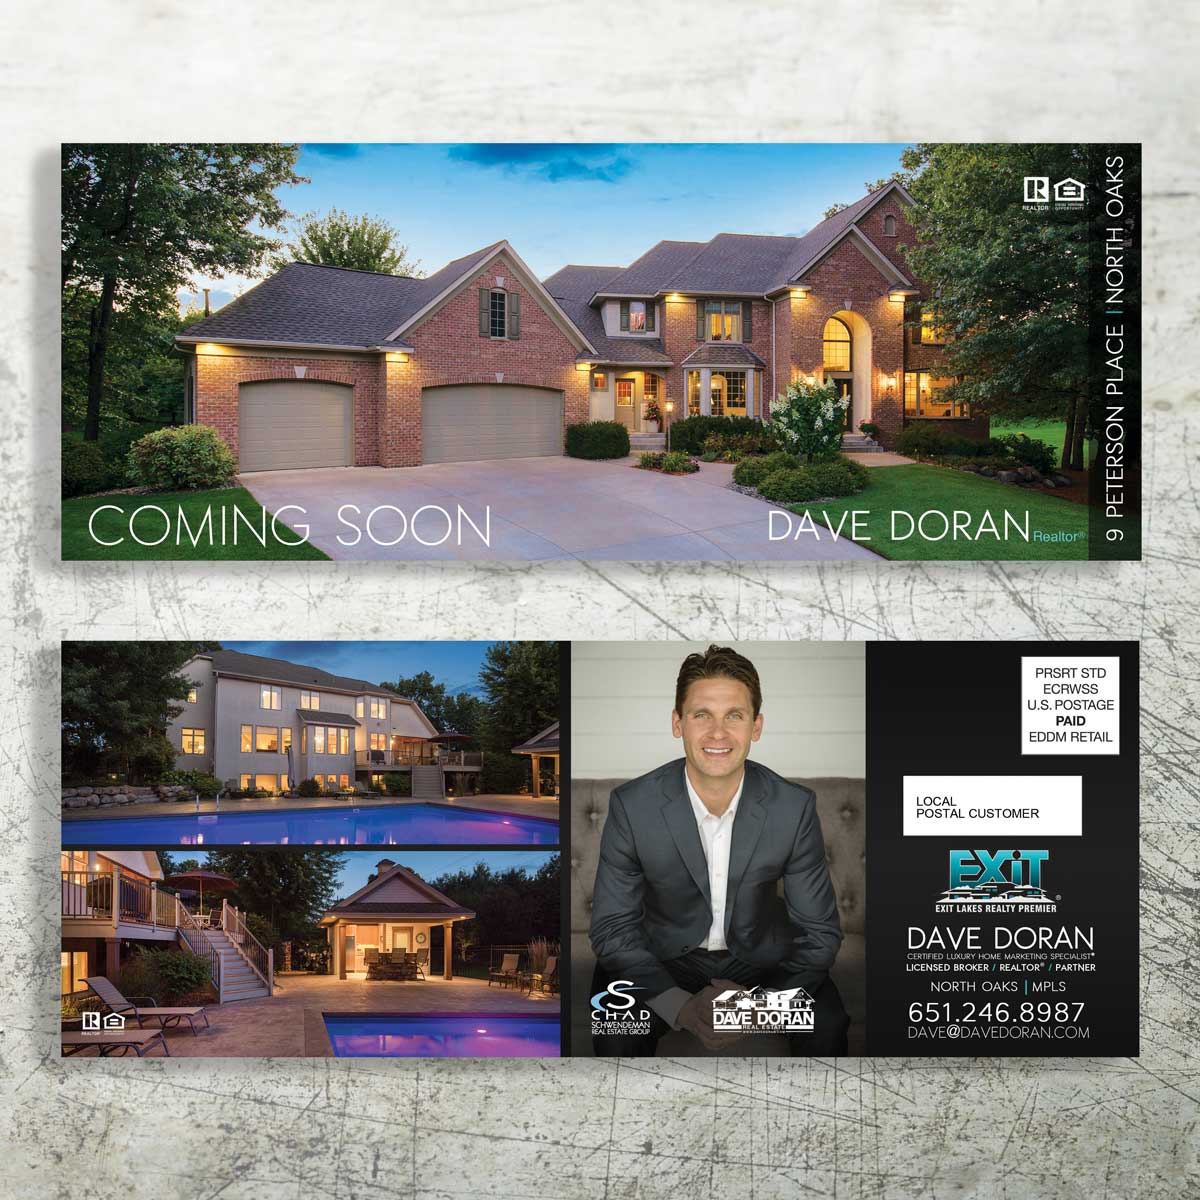 Dave Doran Real Estate Brand Design